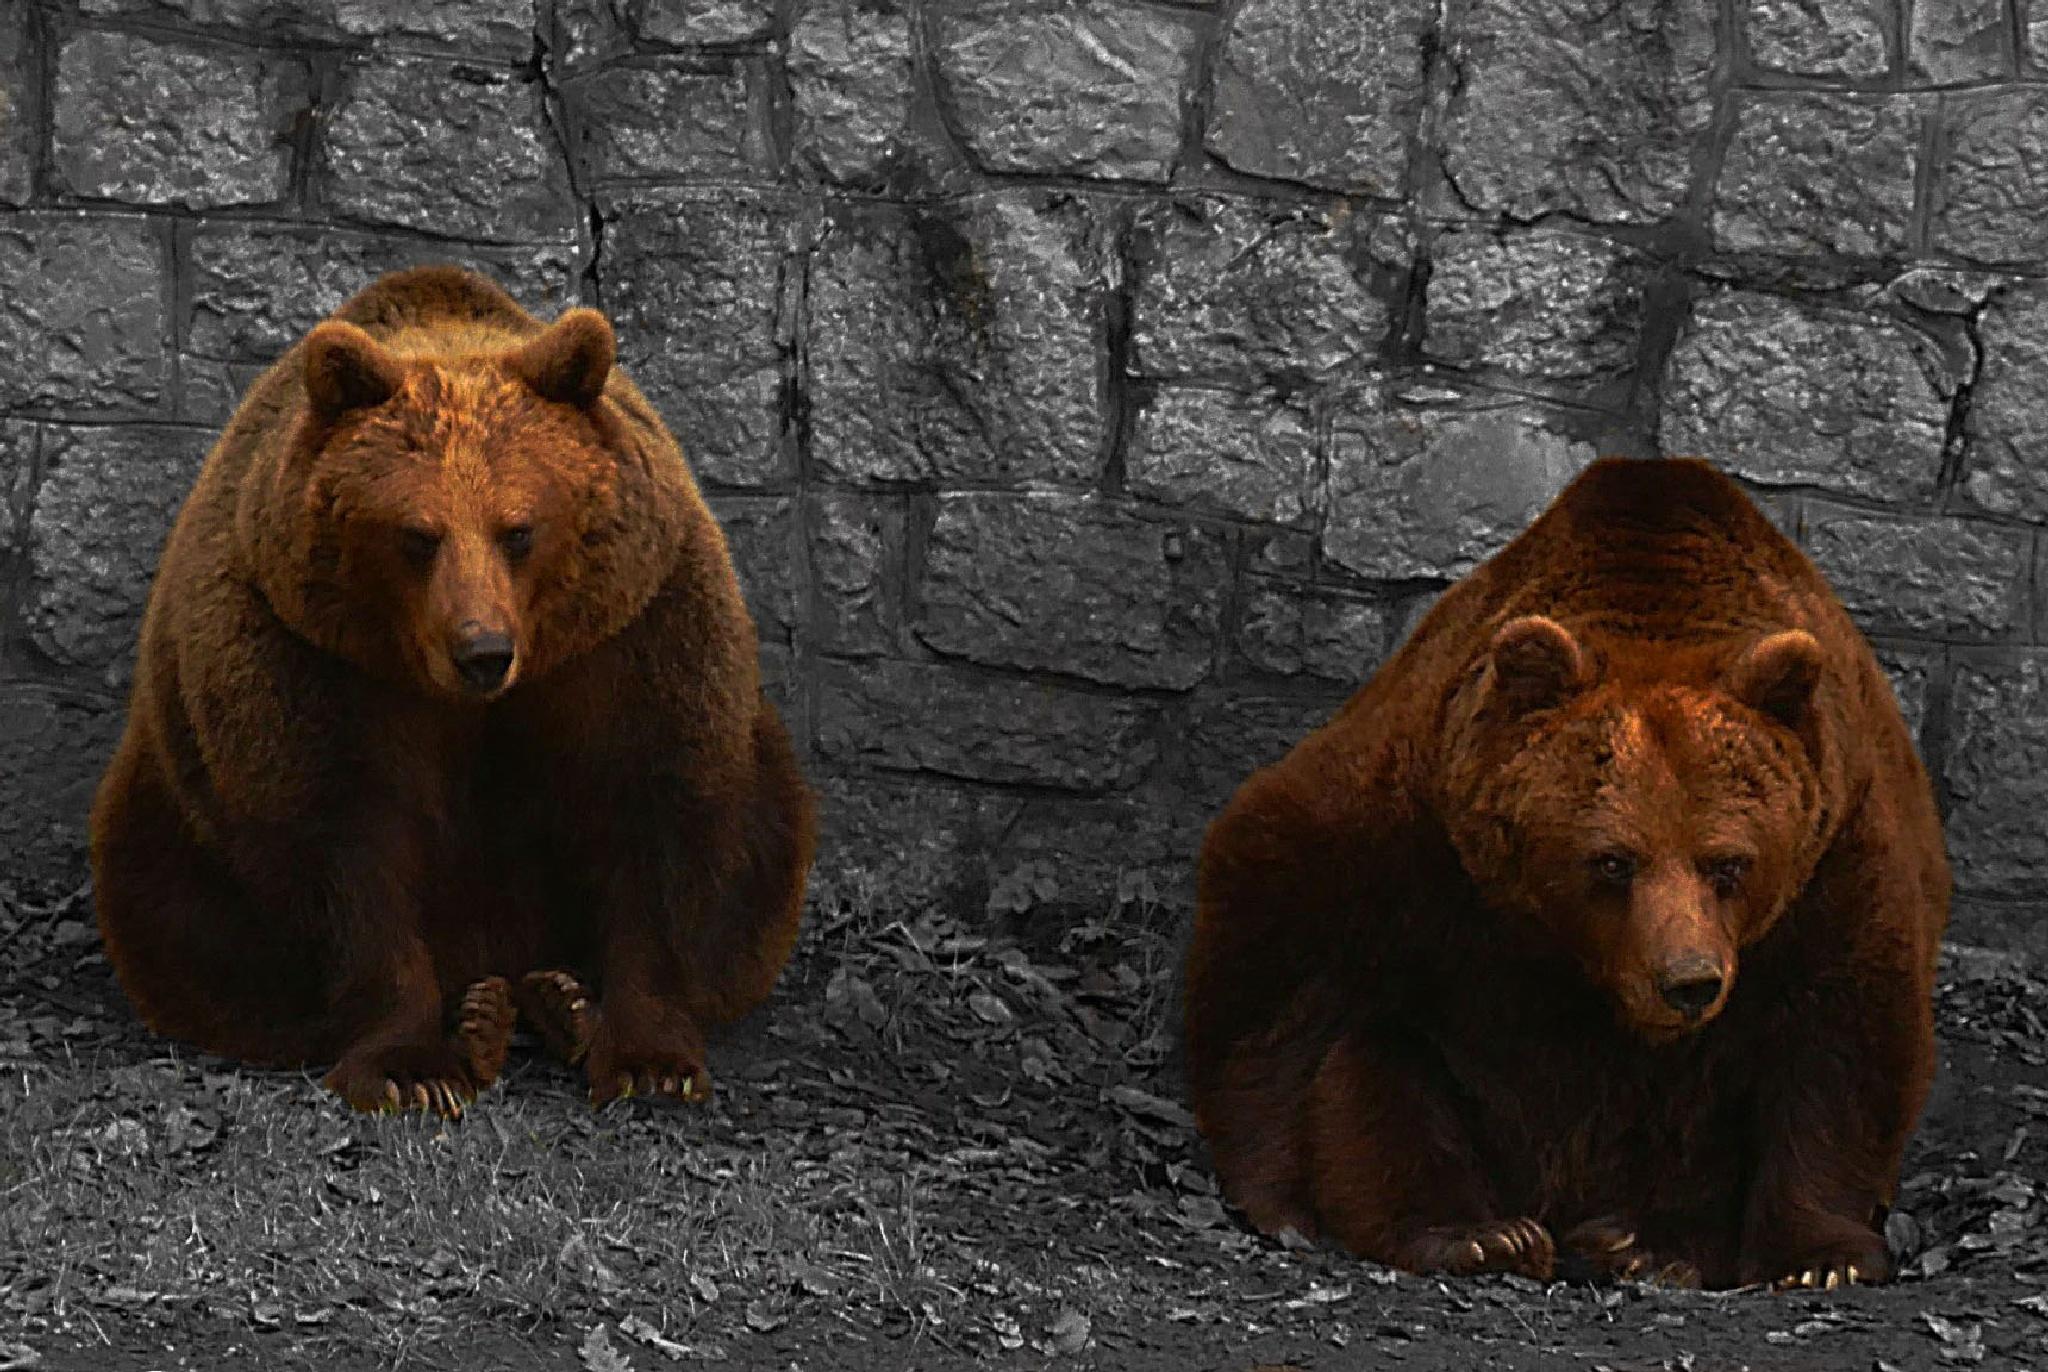 Zoo12 by sreten nakićenović